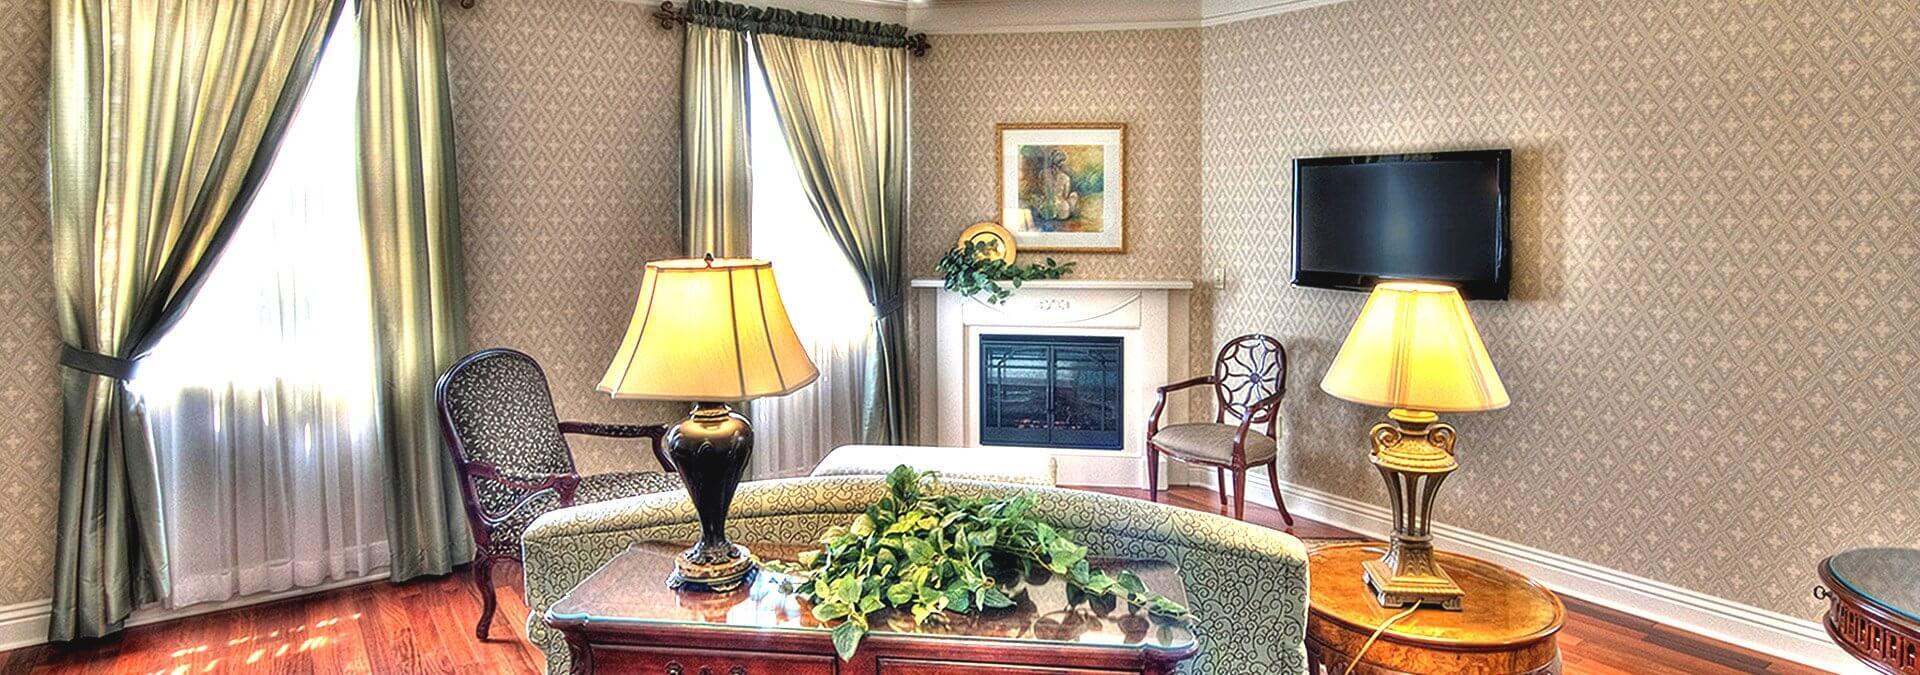 Charley Creek Inn Hotel, Wabash